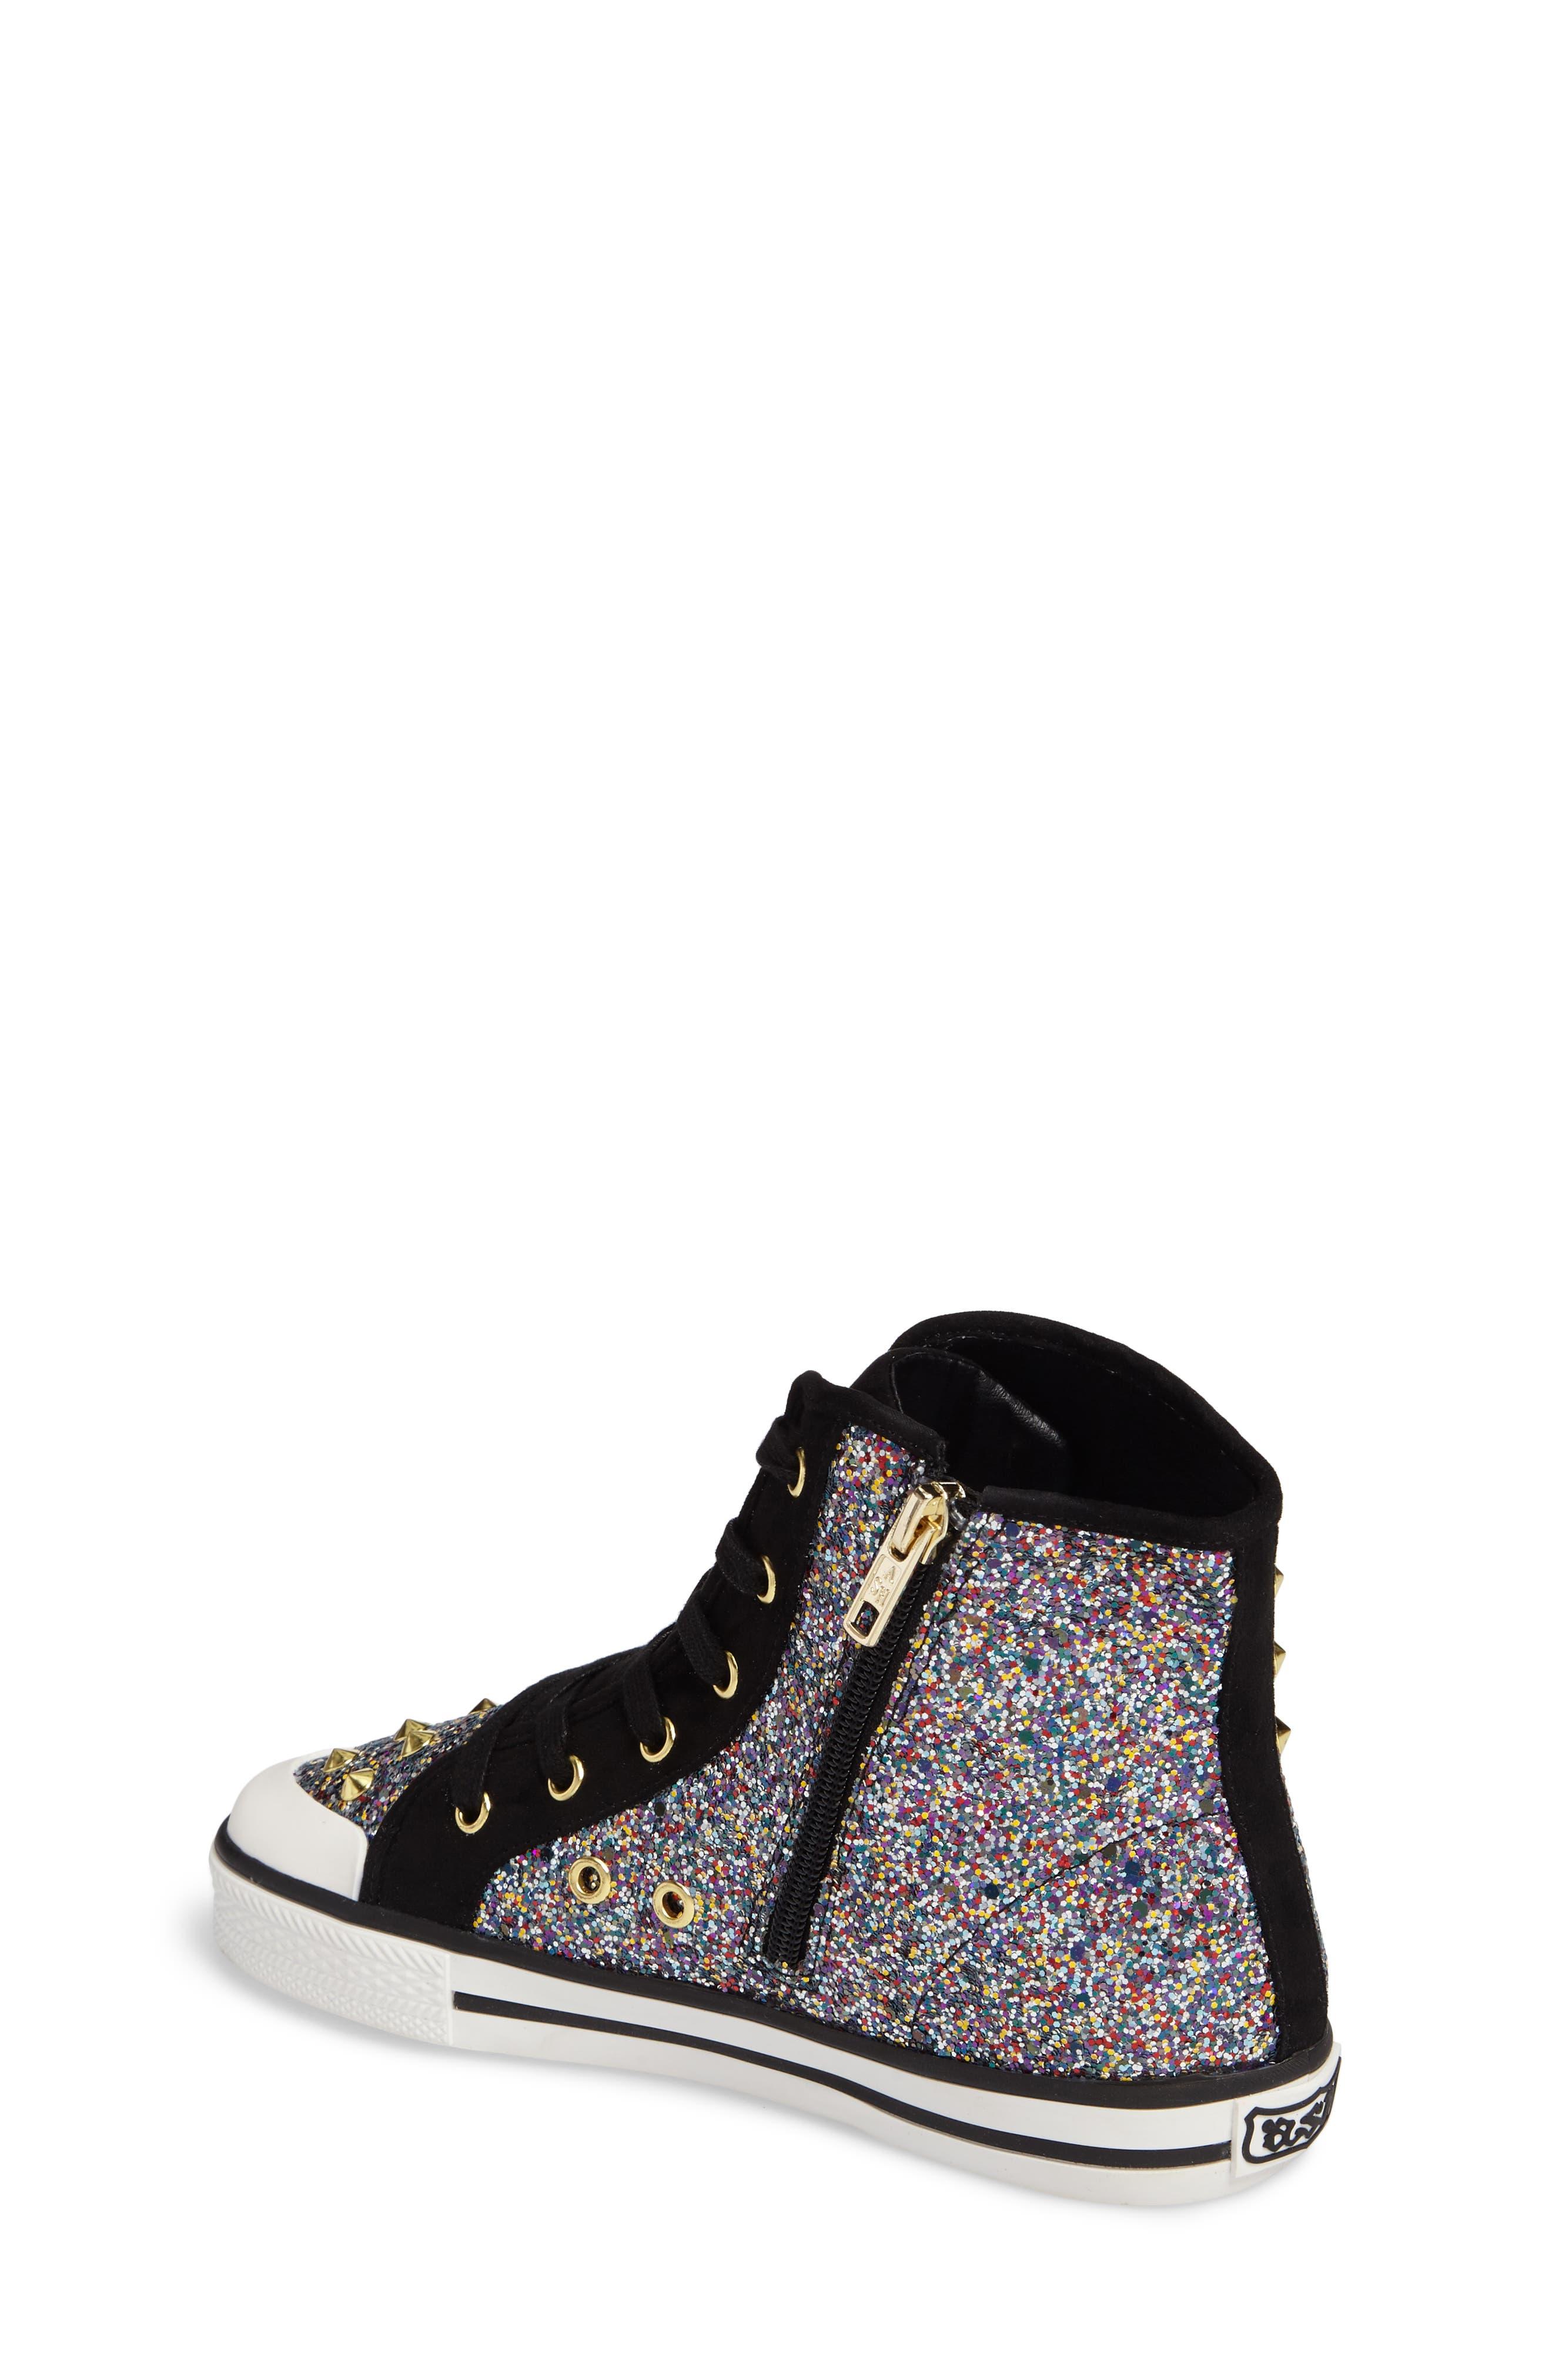 Lita Roe Glittery High Top Sneaker,                             Alternate thumbnail 2, color,                             003